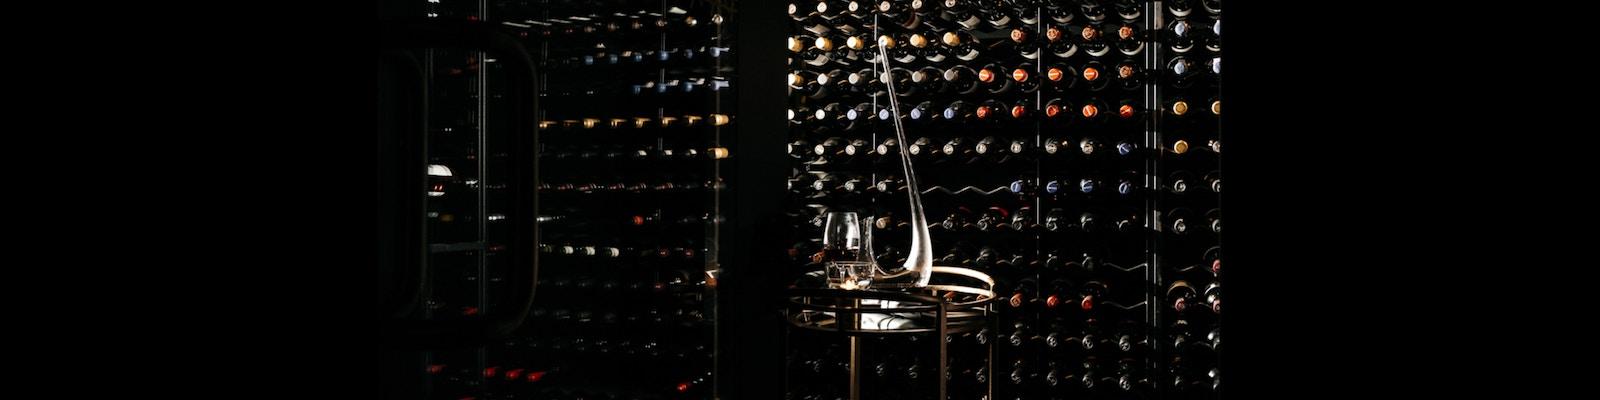 Maha Restaurant 200 bottle Wine cellar